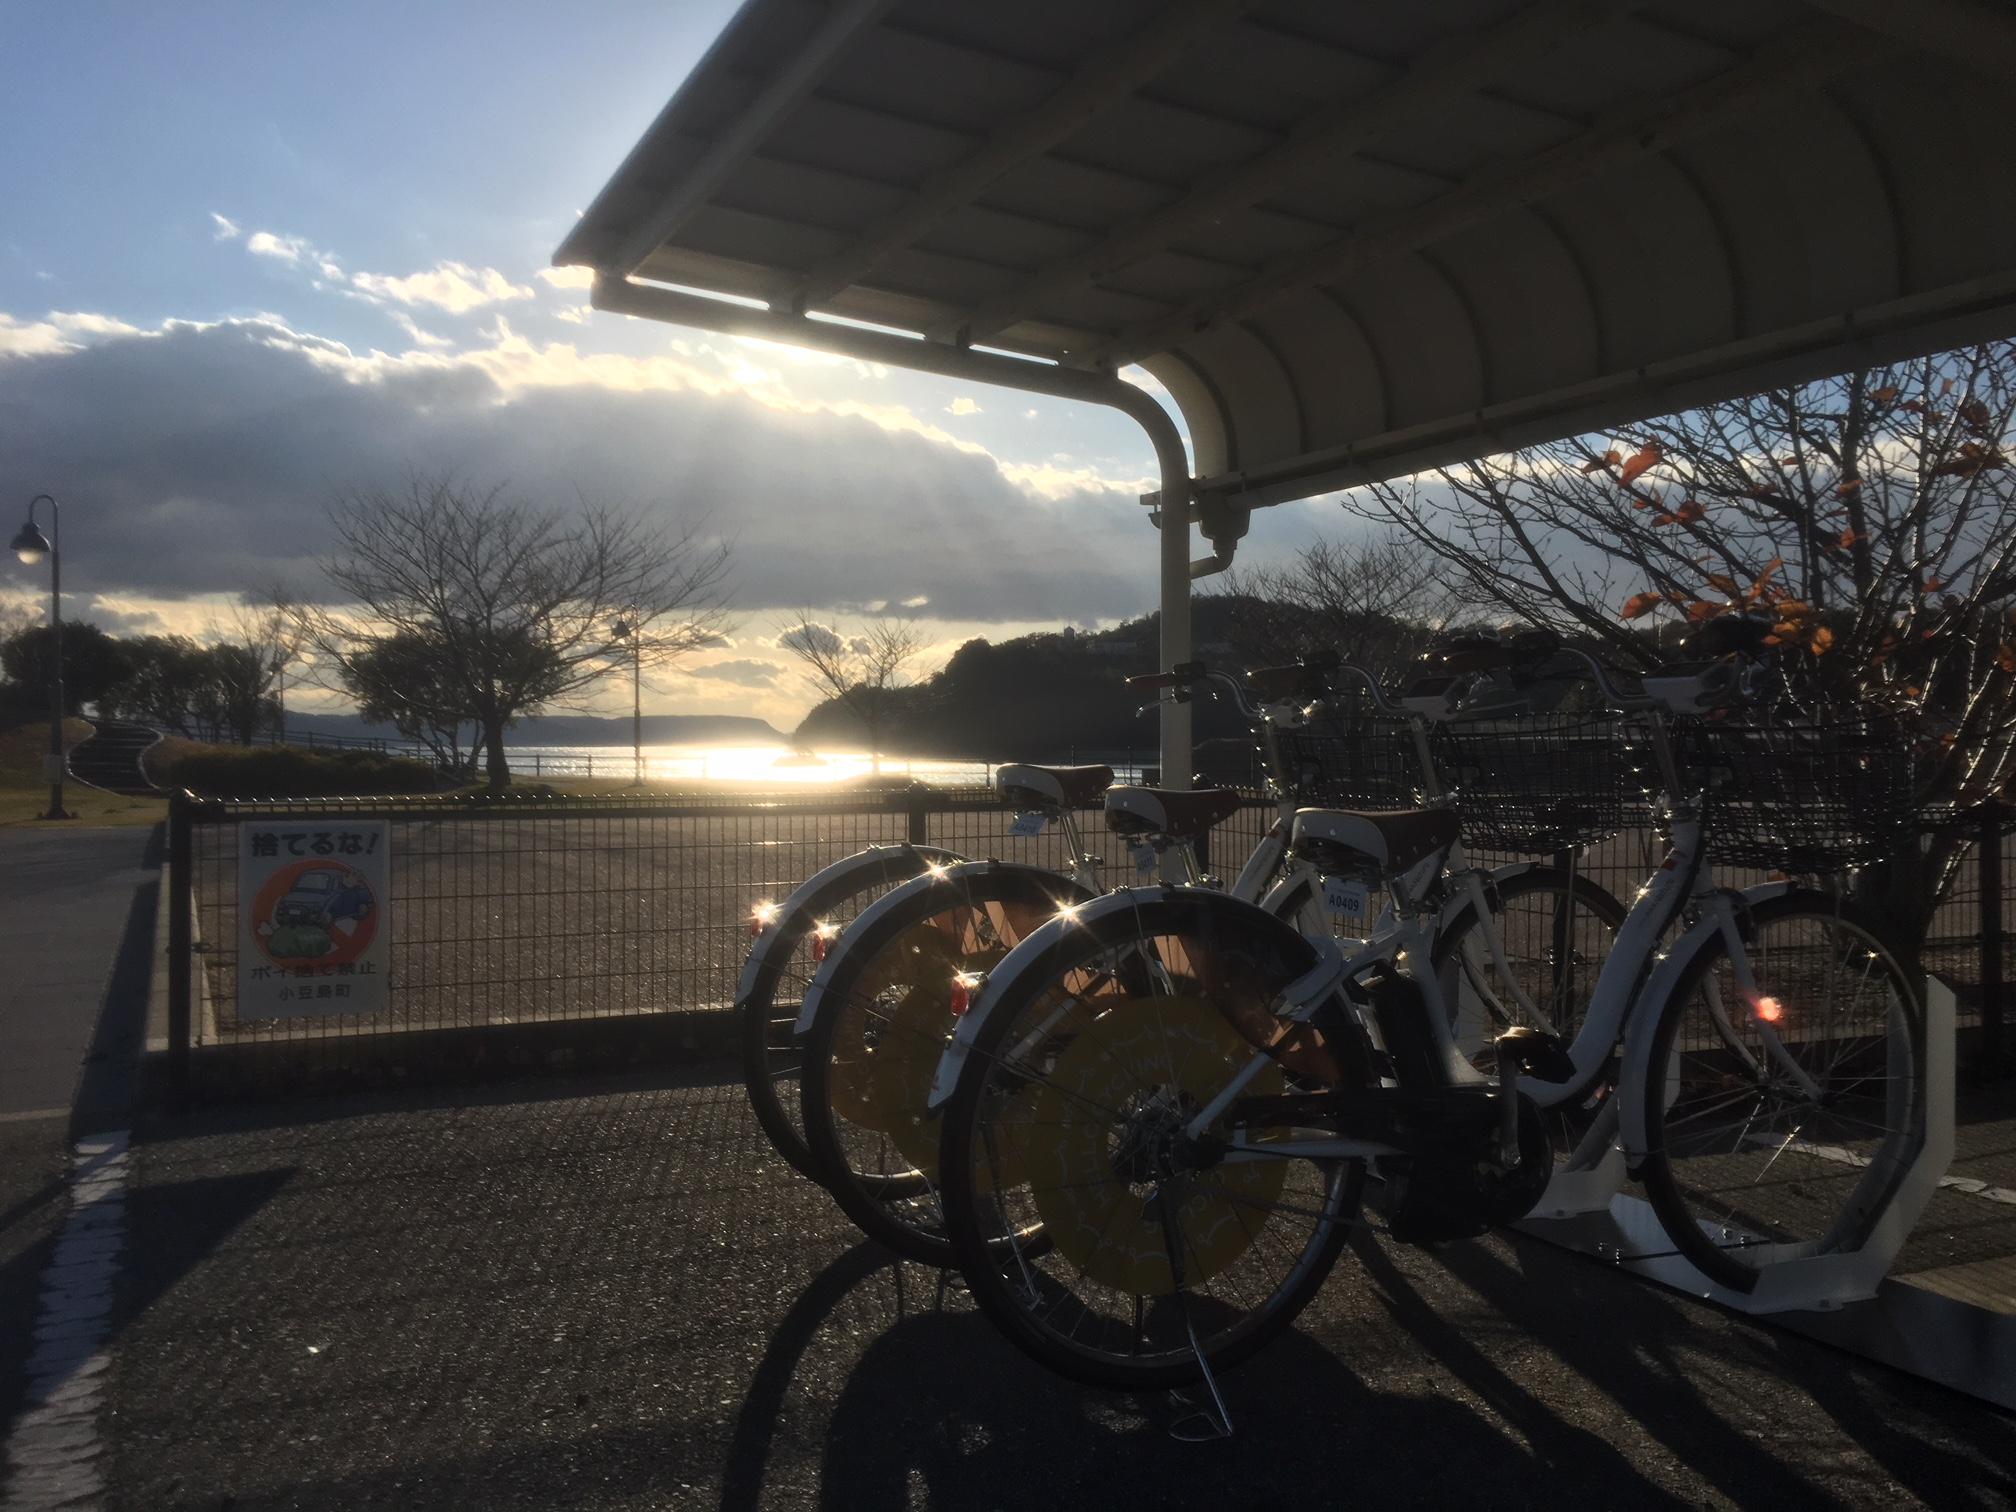 小豆島池田港 駐輪場 (HELLO CYCLING ポート) image